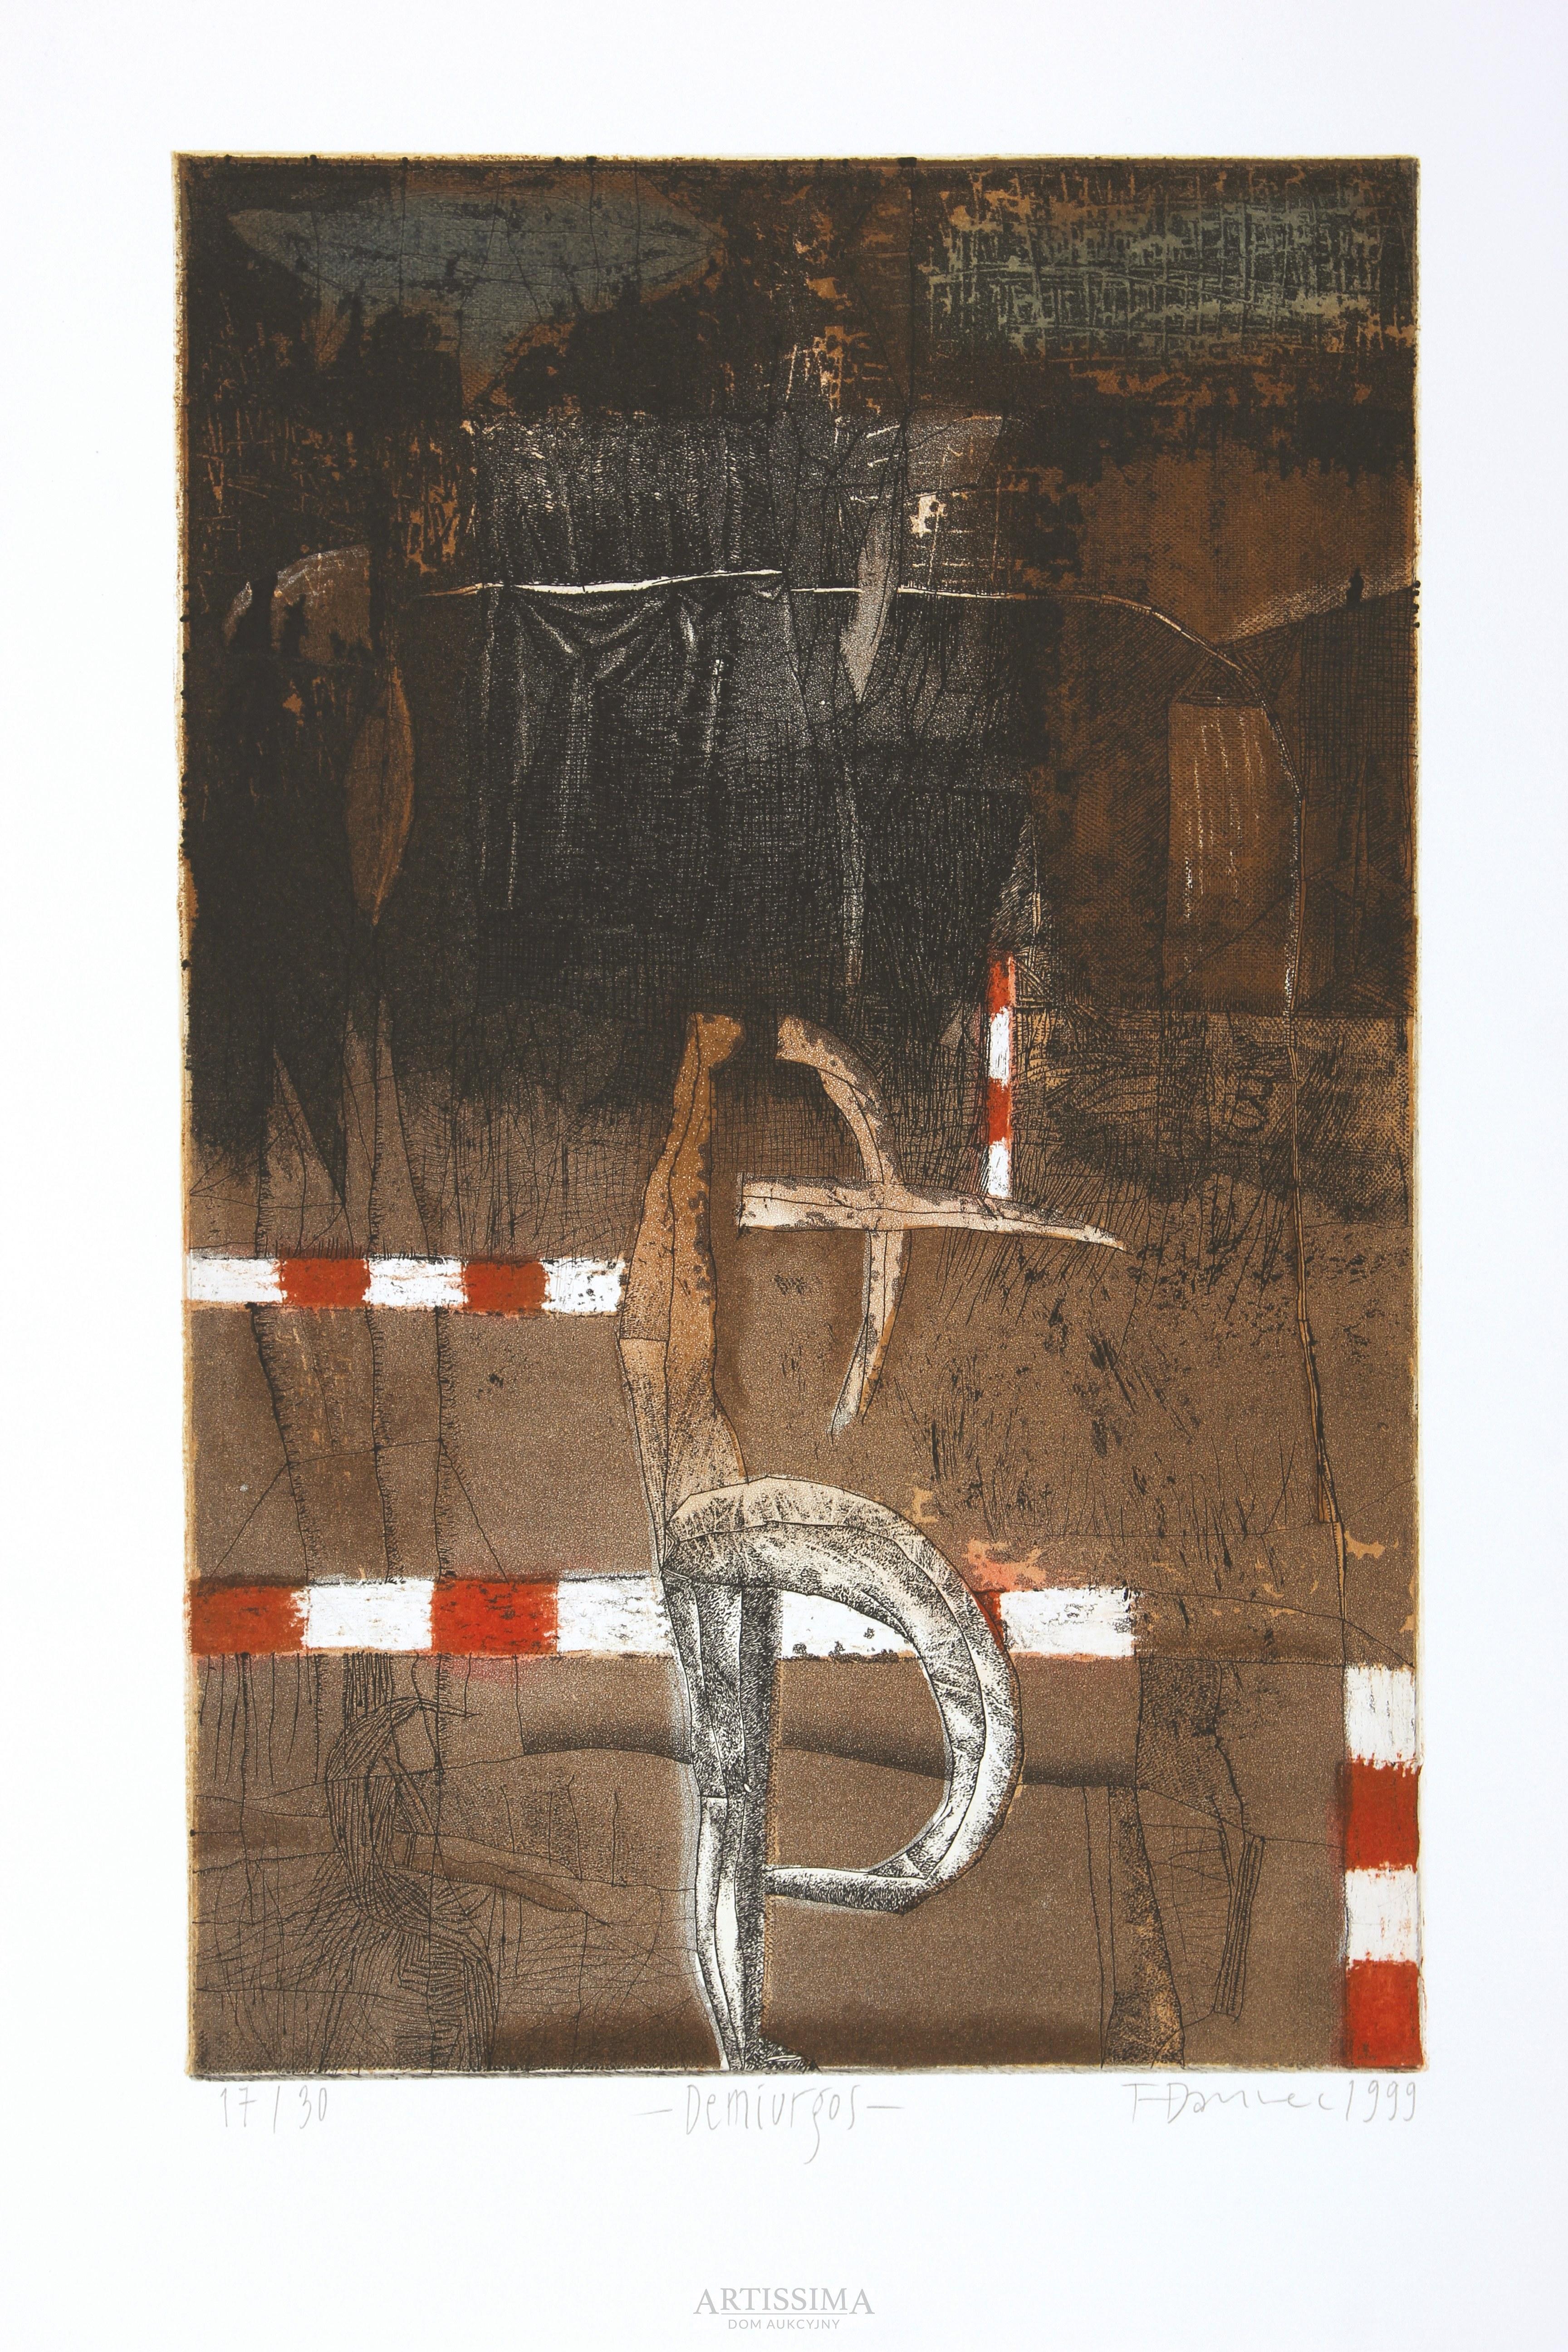 Tomasz Daniec (ur. 1973), Demiurgos, 1999